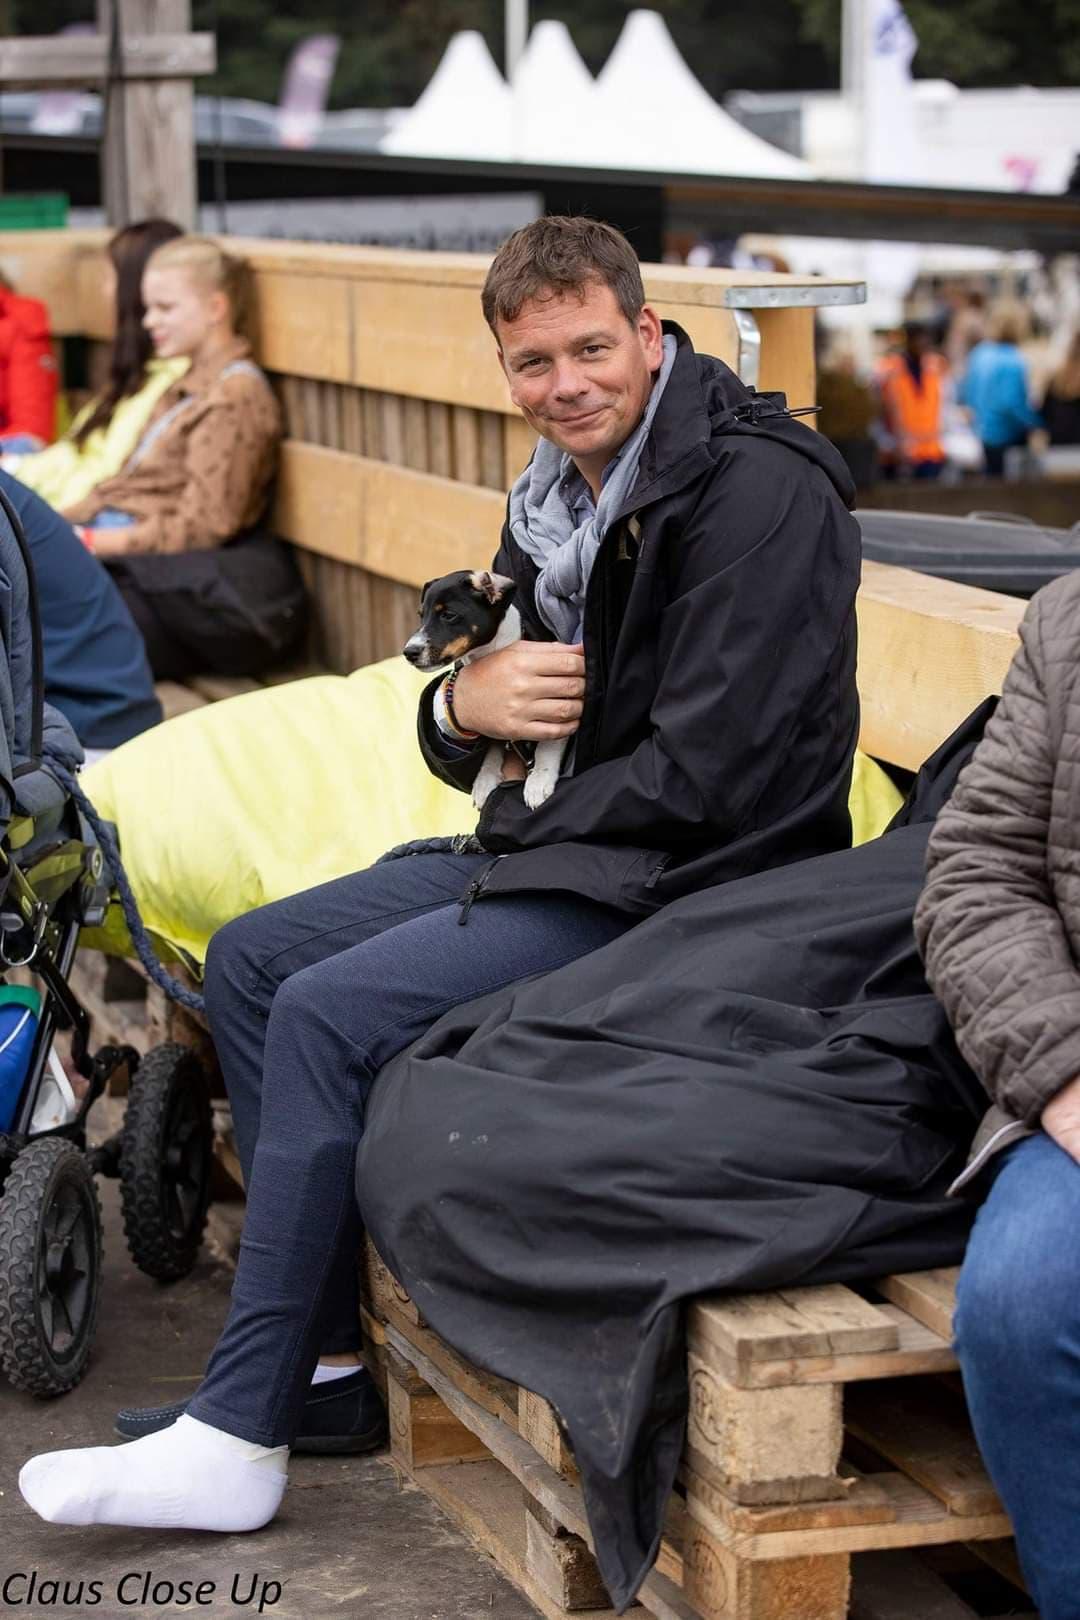 Toni Hassmann 'out' after fall at Outdoor Wierden